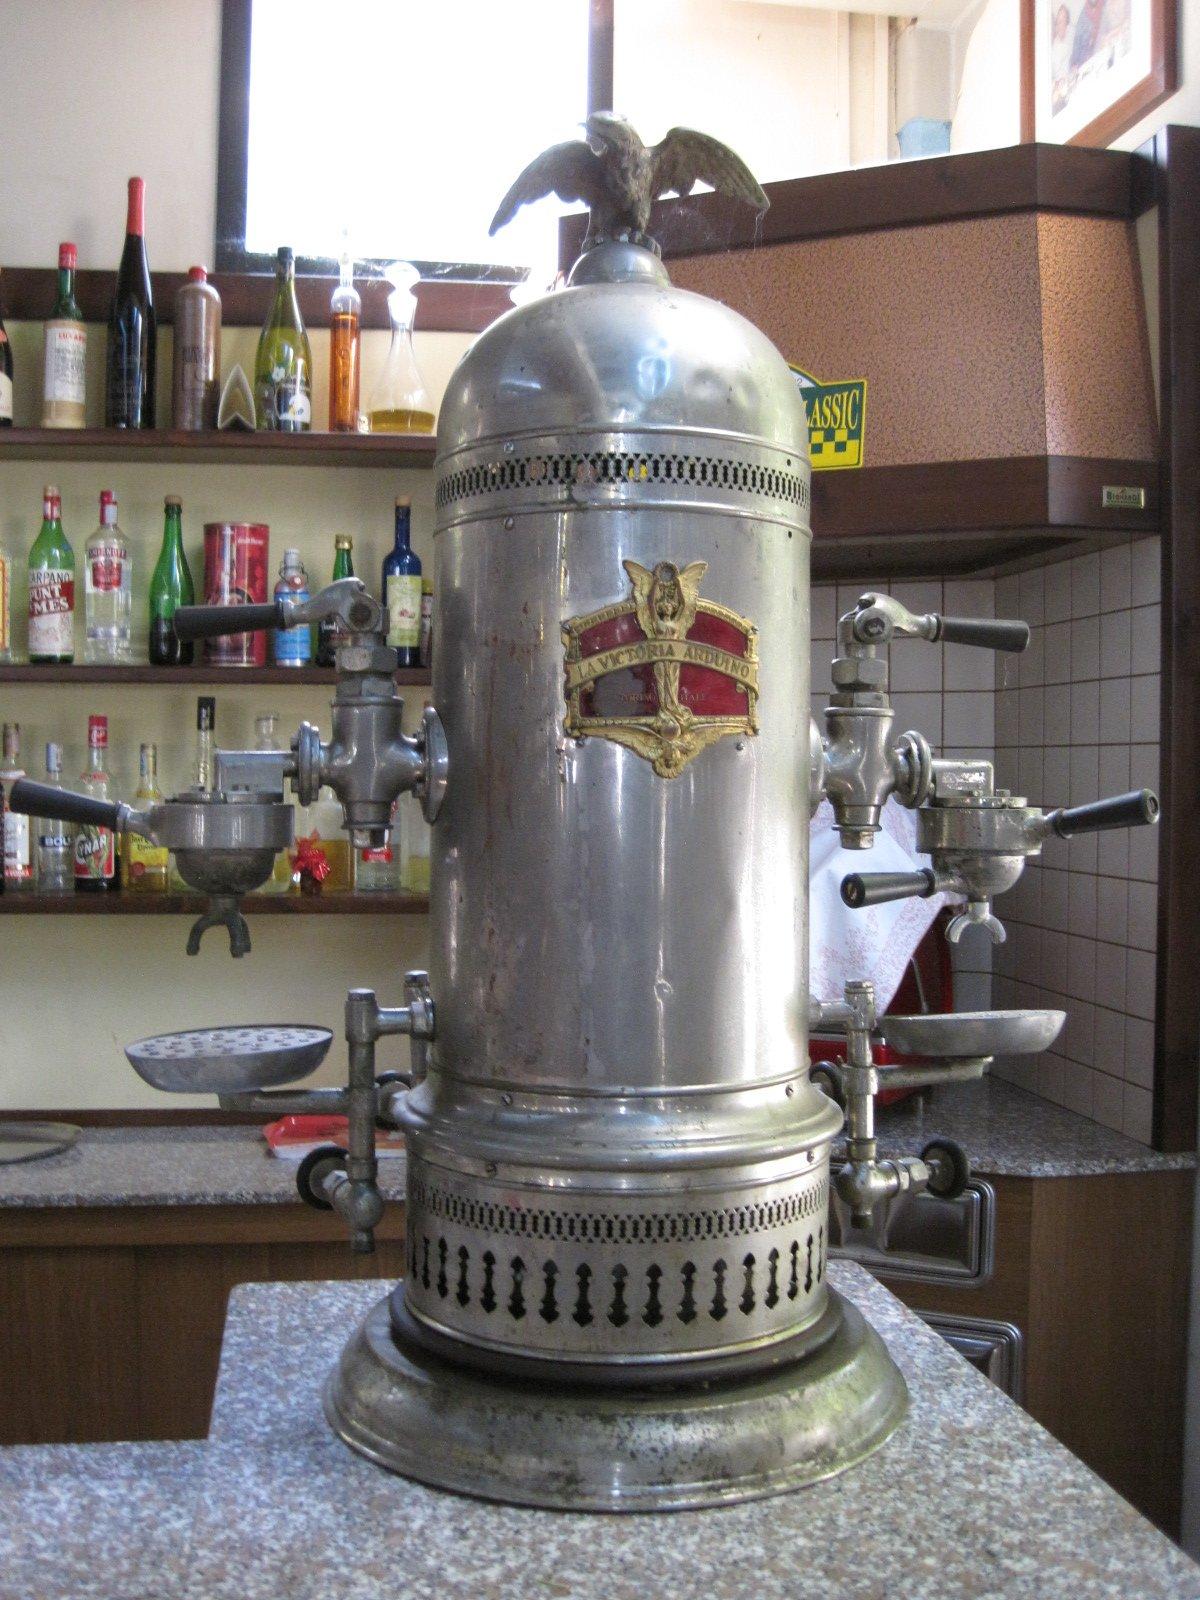 La Macchina Cafe Orrington Avenue Evanston Il